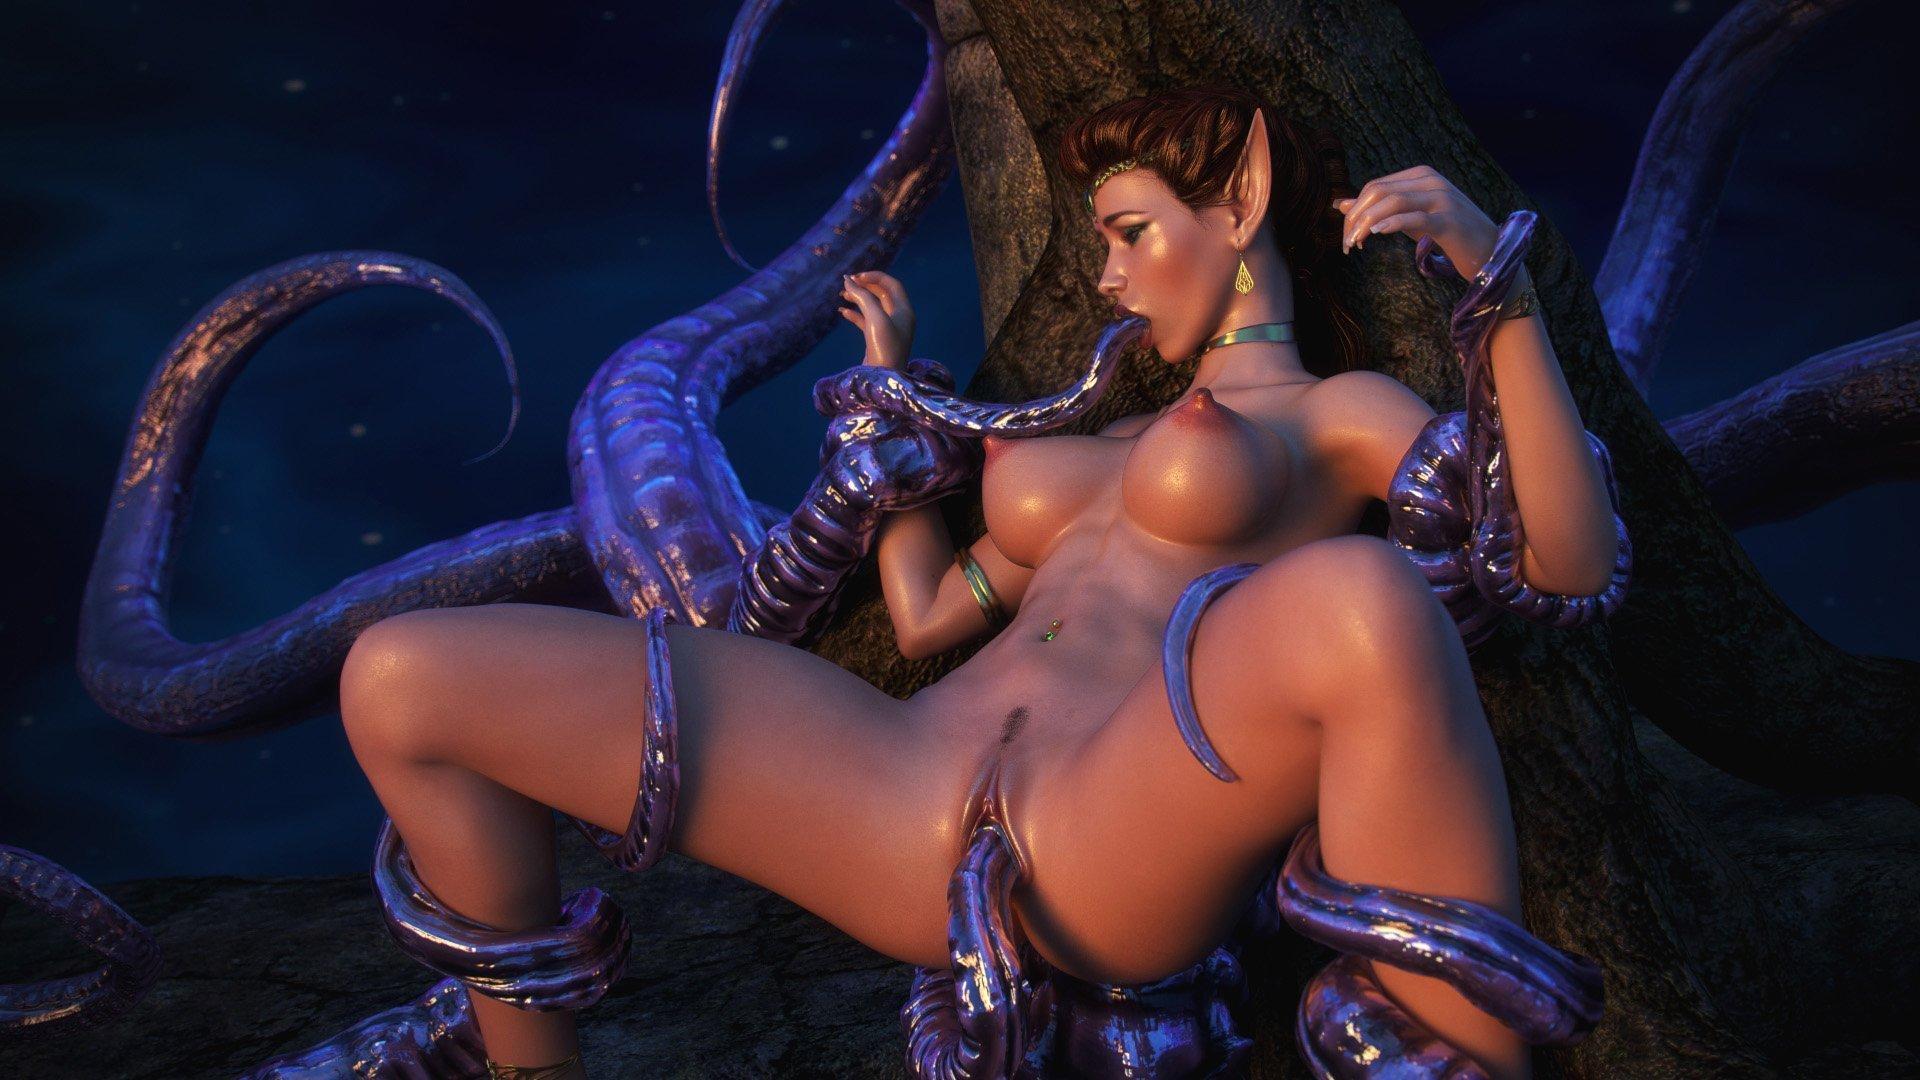 hentai 3d tentacles